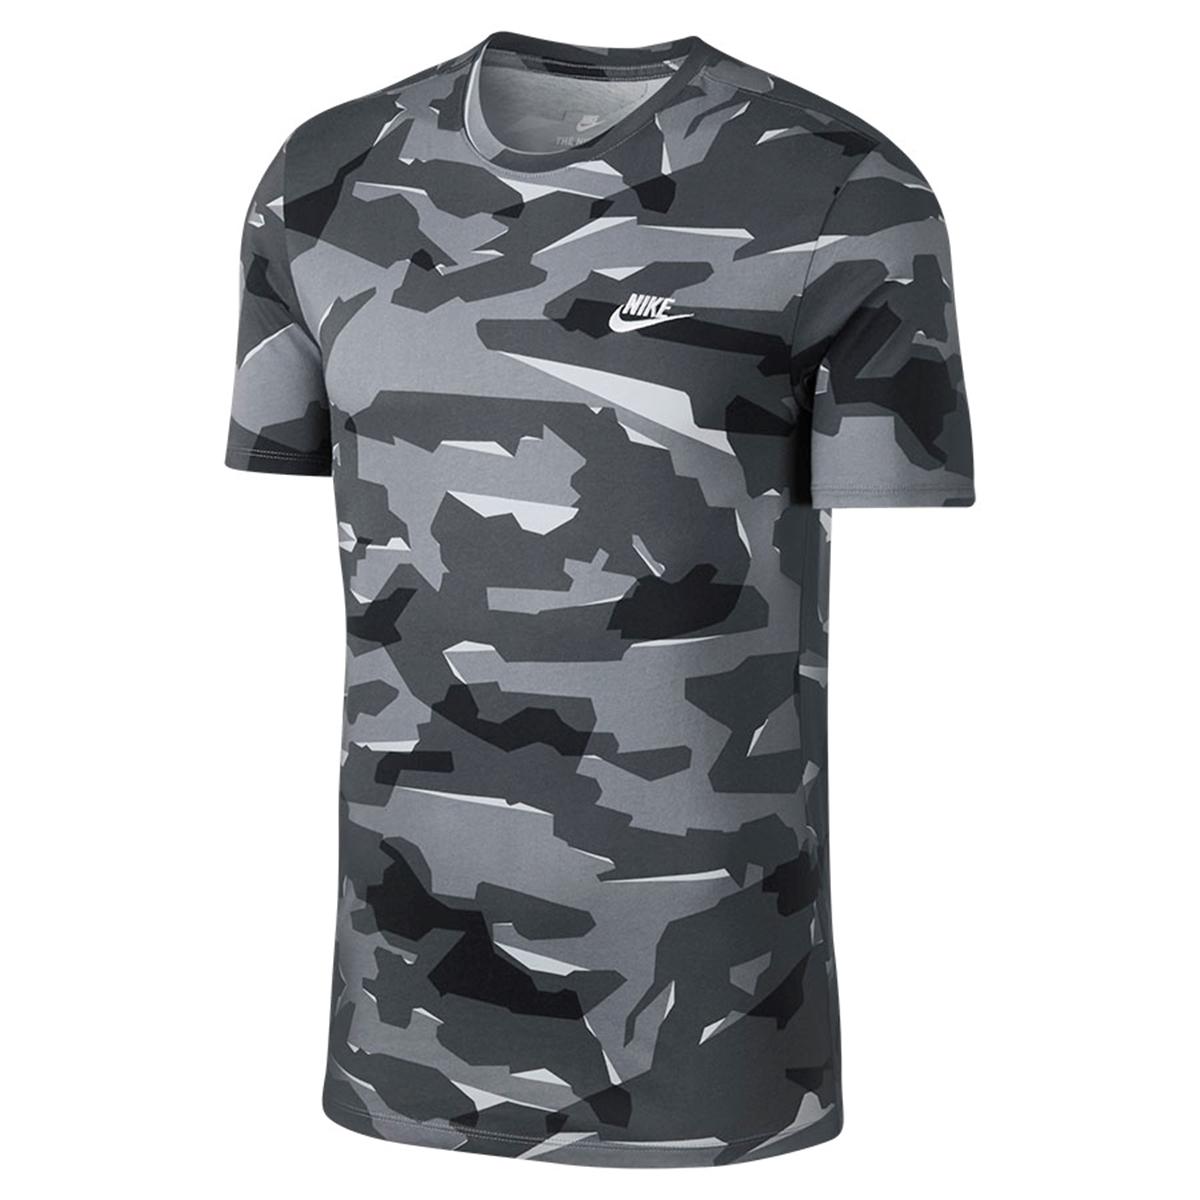 c40c127f Nike M NSW TEE CAMO PACK 1 AJ6631-012- Nava Sport - Vi selger klær ...